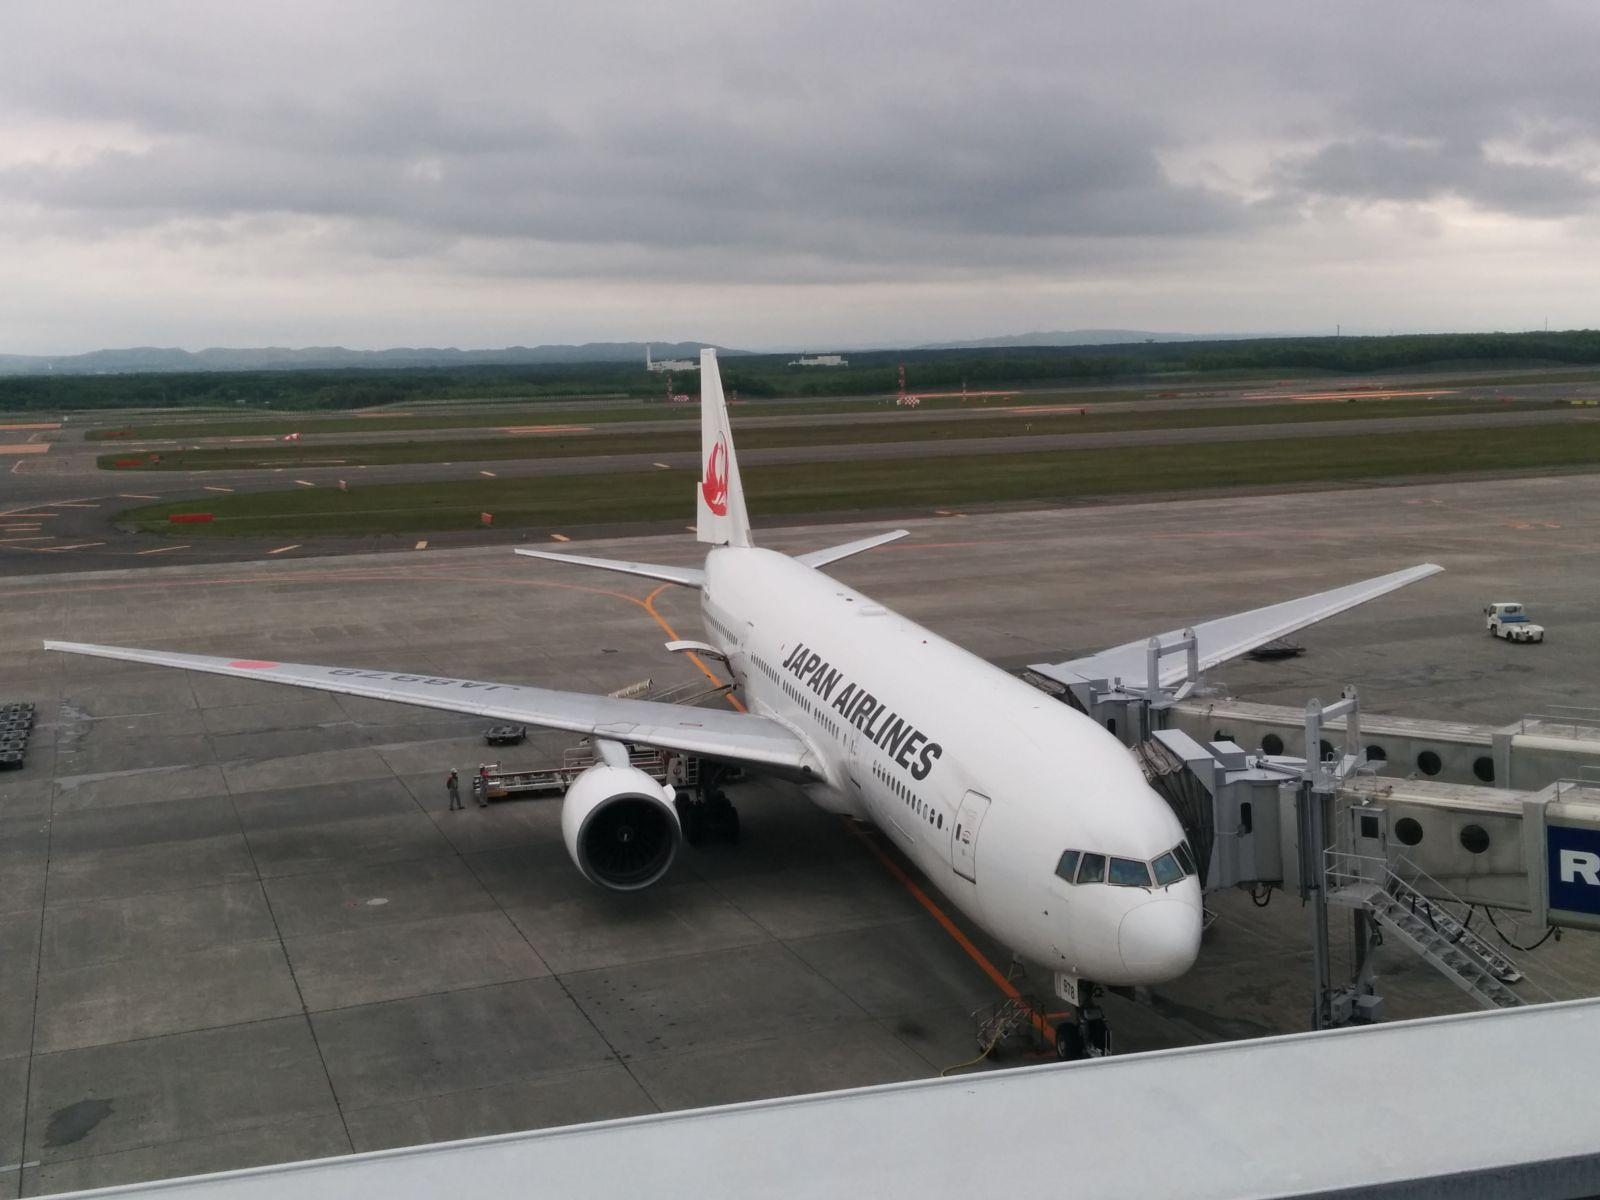 【新千歳空港】新緑の新千歳空港・展望デッキ観光写真